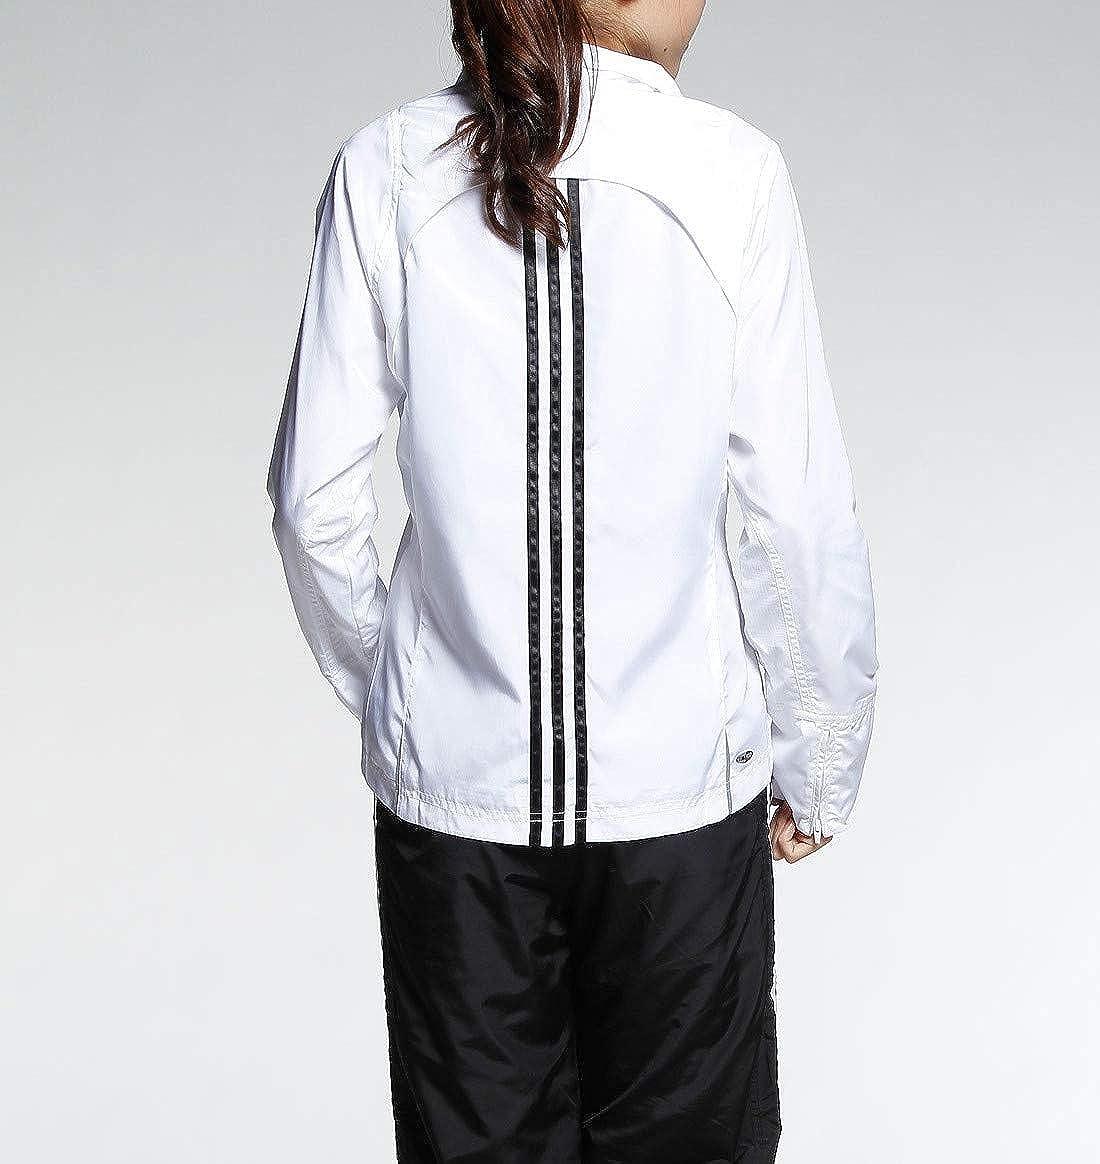 adidas Hochwertiger Funktions Trainingsanzug 365 WOV Suit